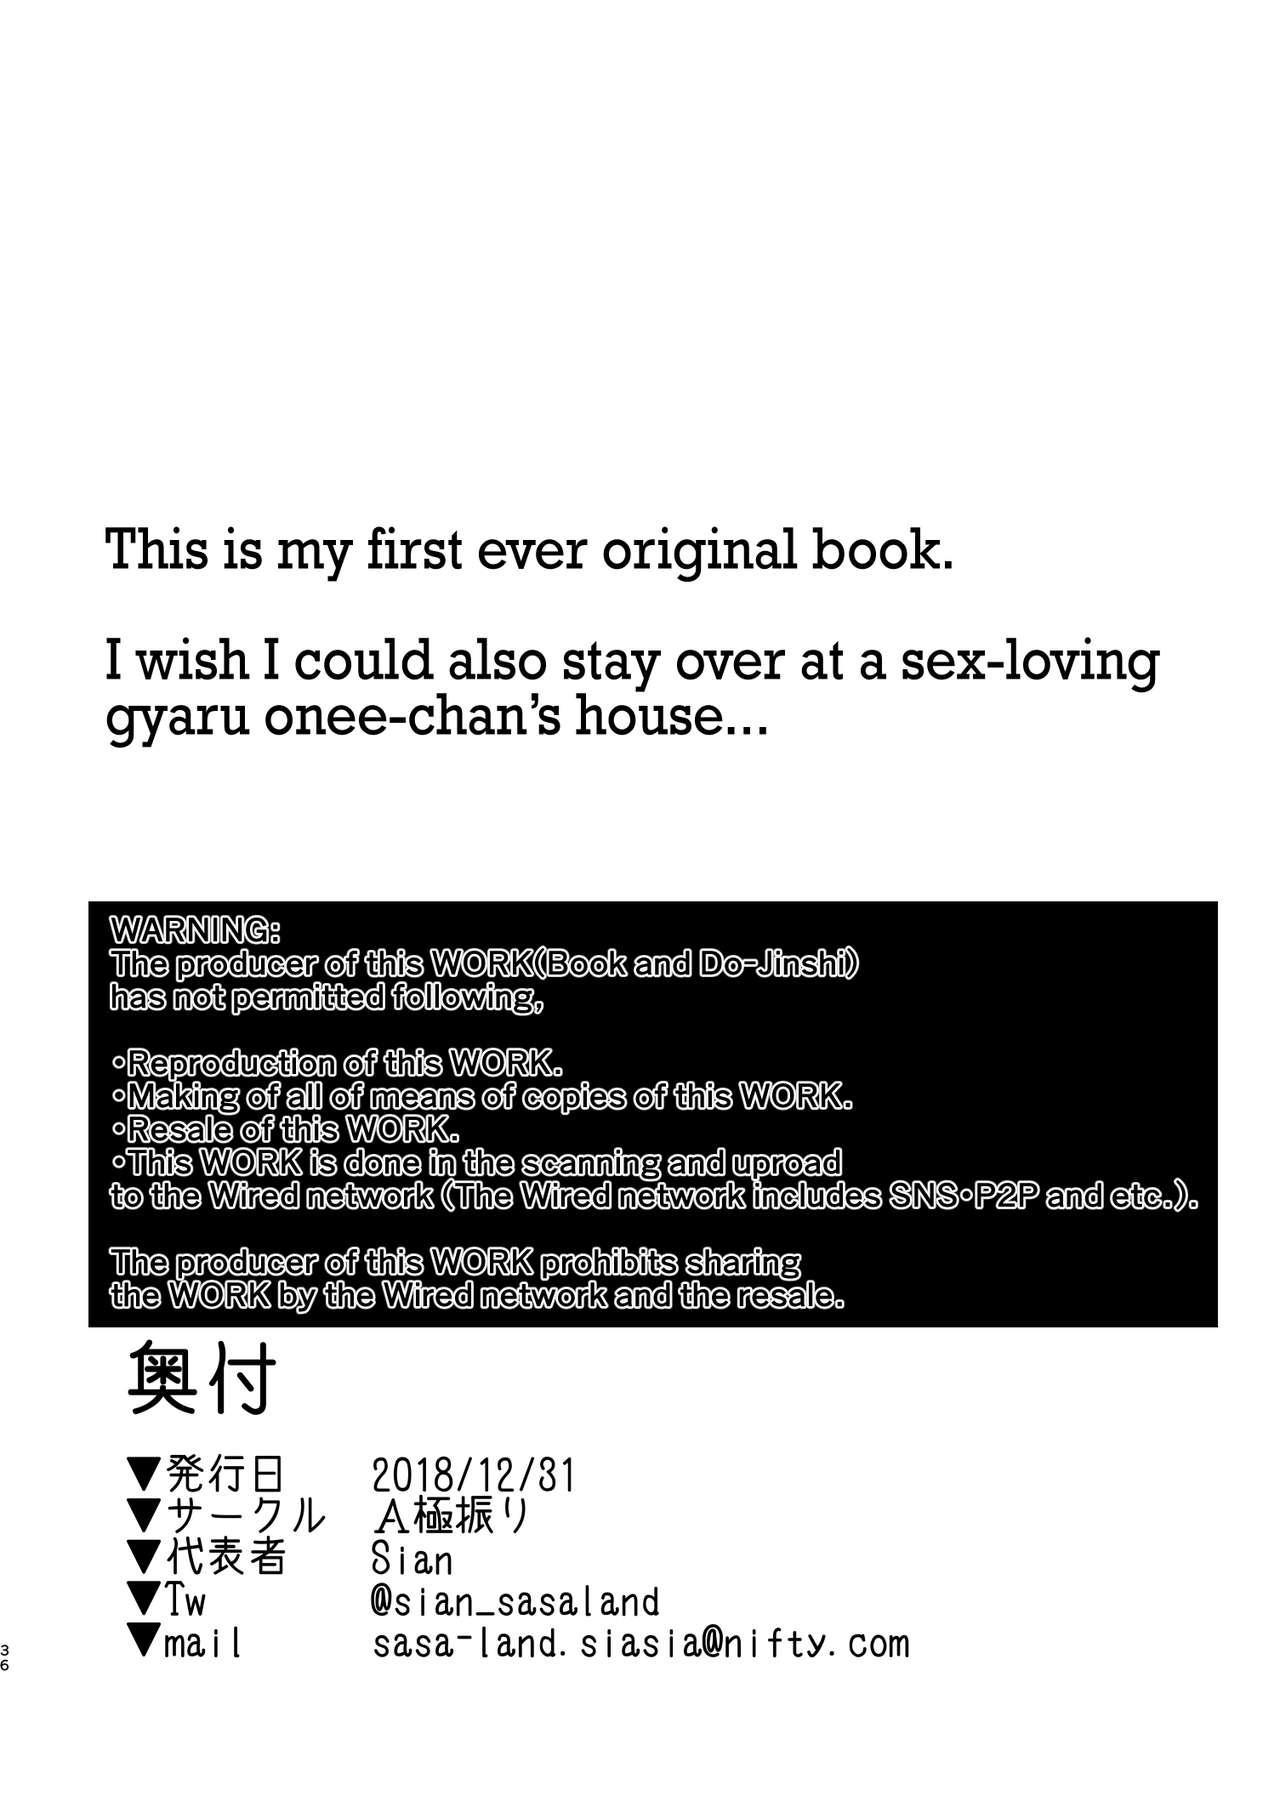 [A Gokuburi (Sian)] Otomari Shita no wa H na Gal Onee-chan-tachi no Ouchi deshita   The Place I Stayed Over at Belonged to Perverted Gyaru Onee-chans [English] [_wanq] [Digital] 34